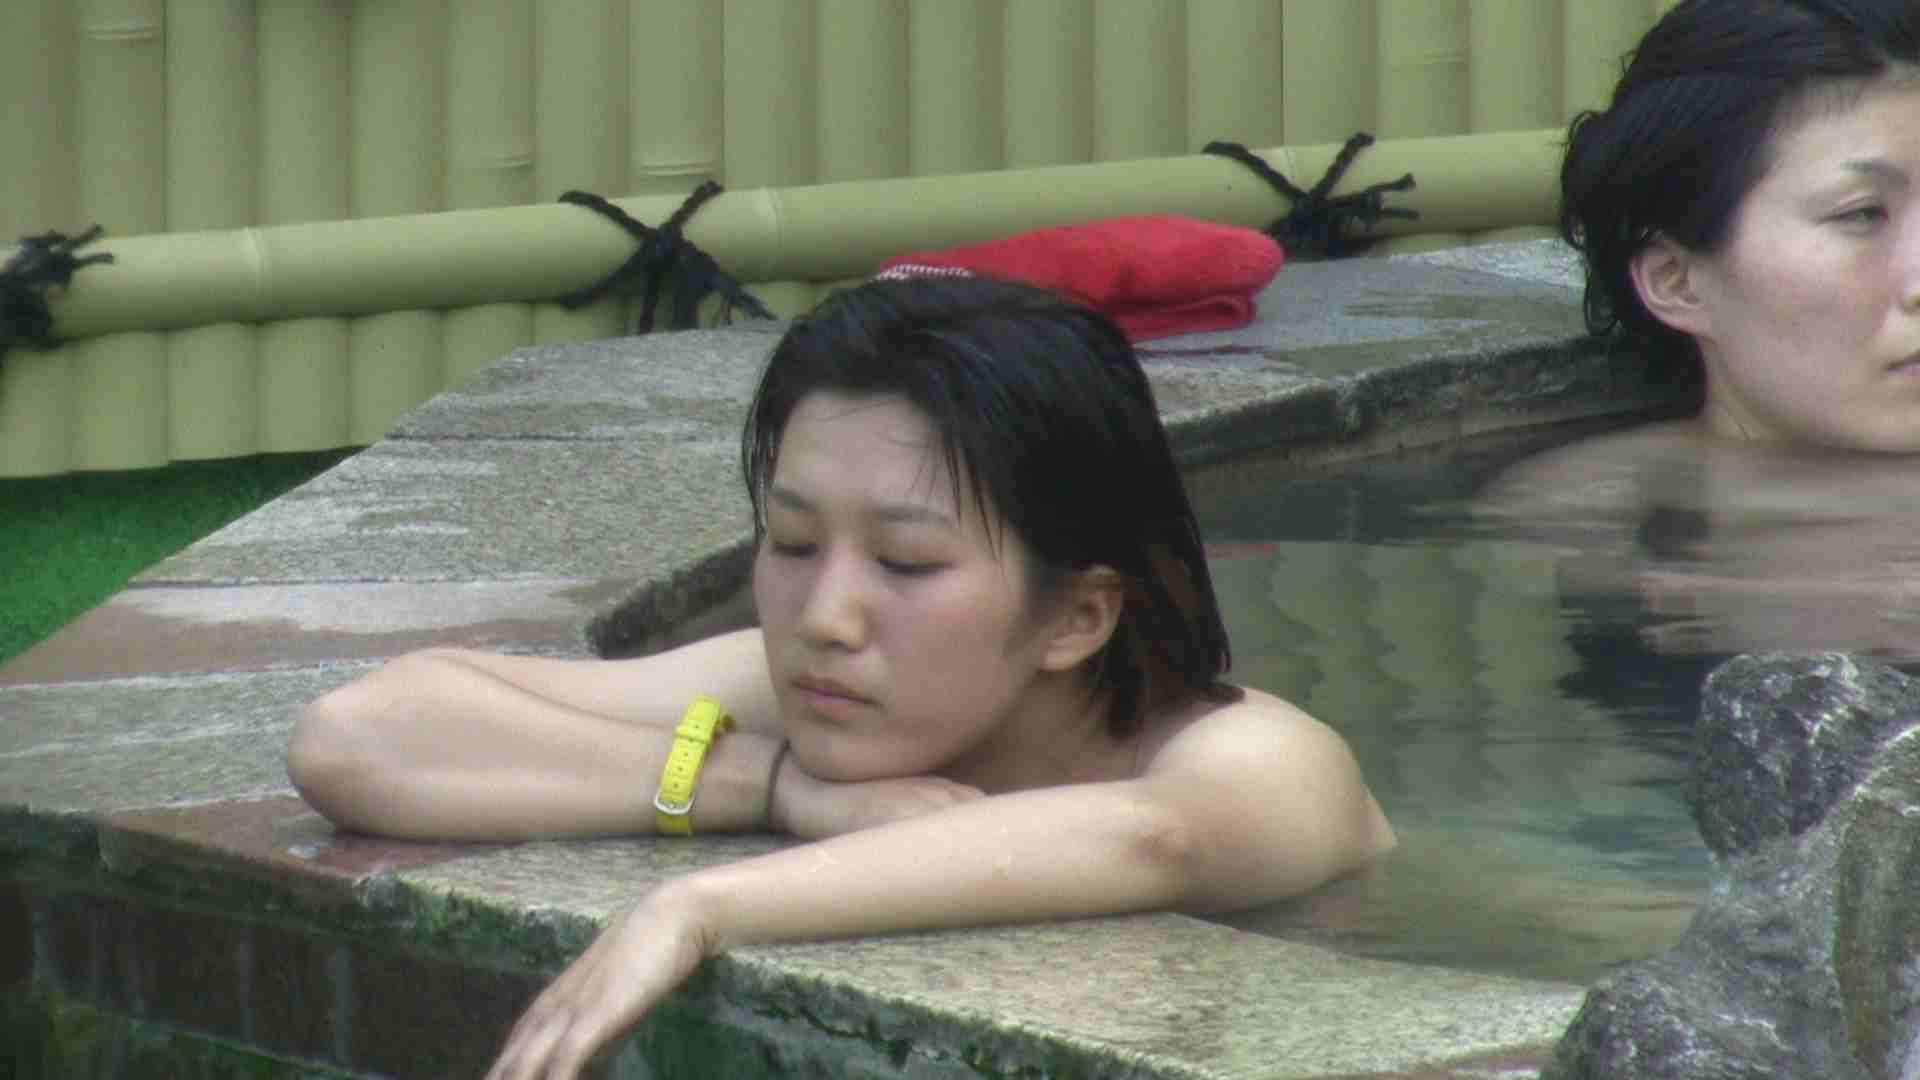 Aquaな露天風呂Vol.132 露天風呂編  78PIX 66